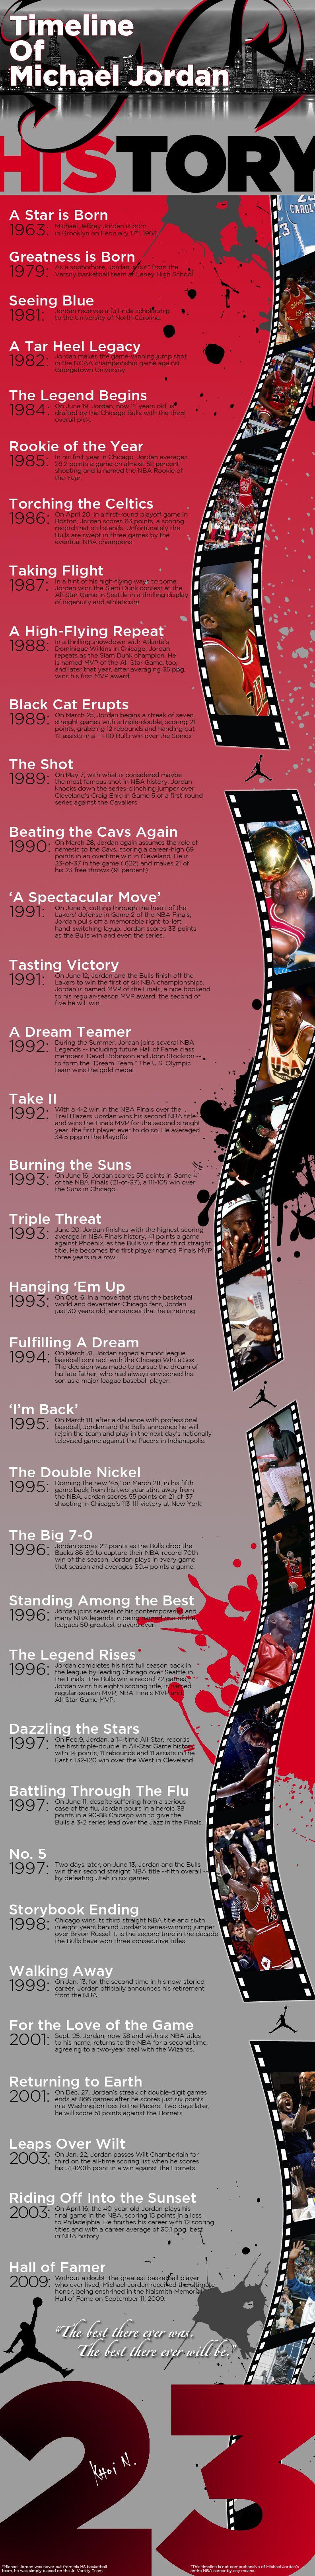 Timeline of Michael Jordan